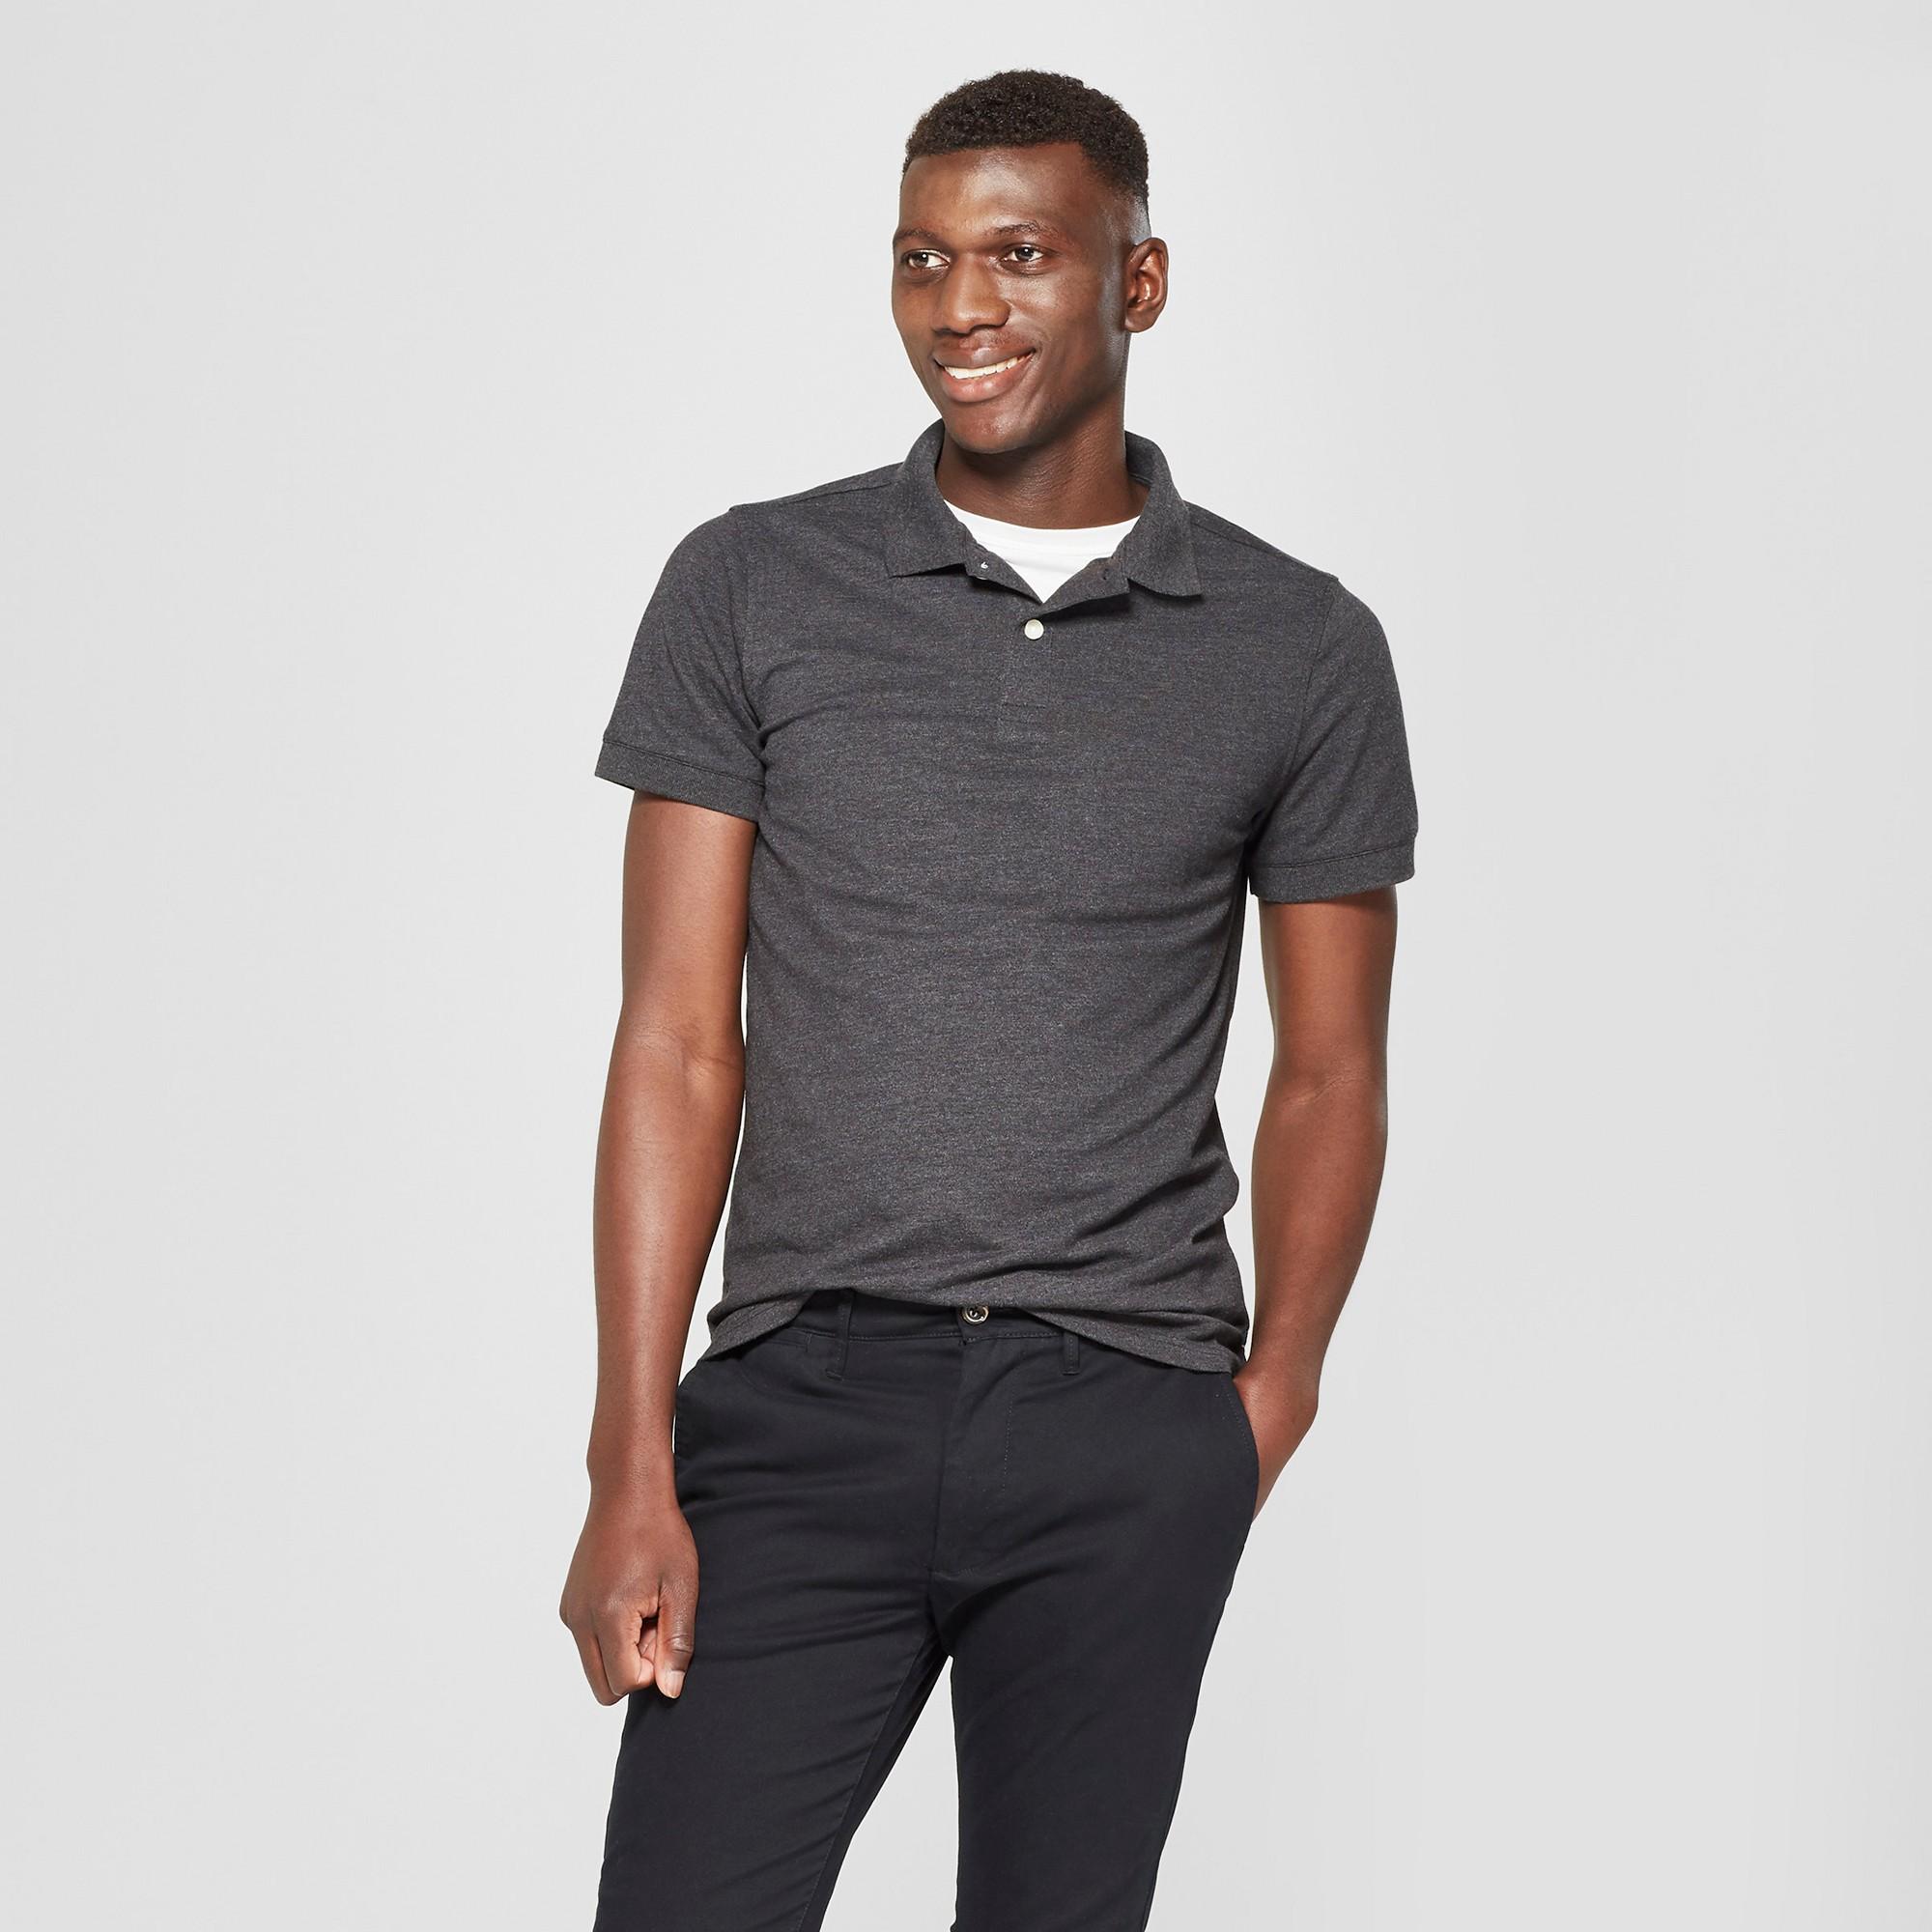 Men's Short Sleeve Slim Fit Loring Polo Shirt - Goodfellow & Co Railroad Gray L